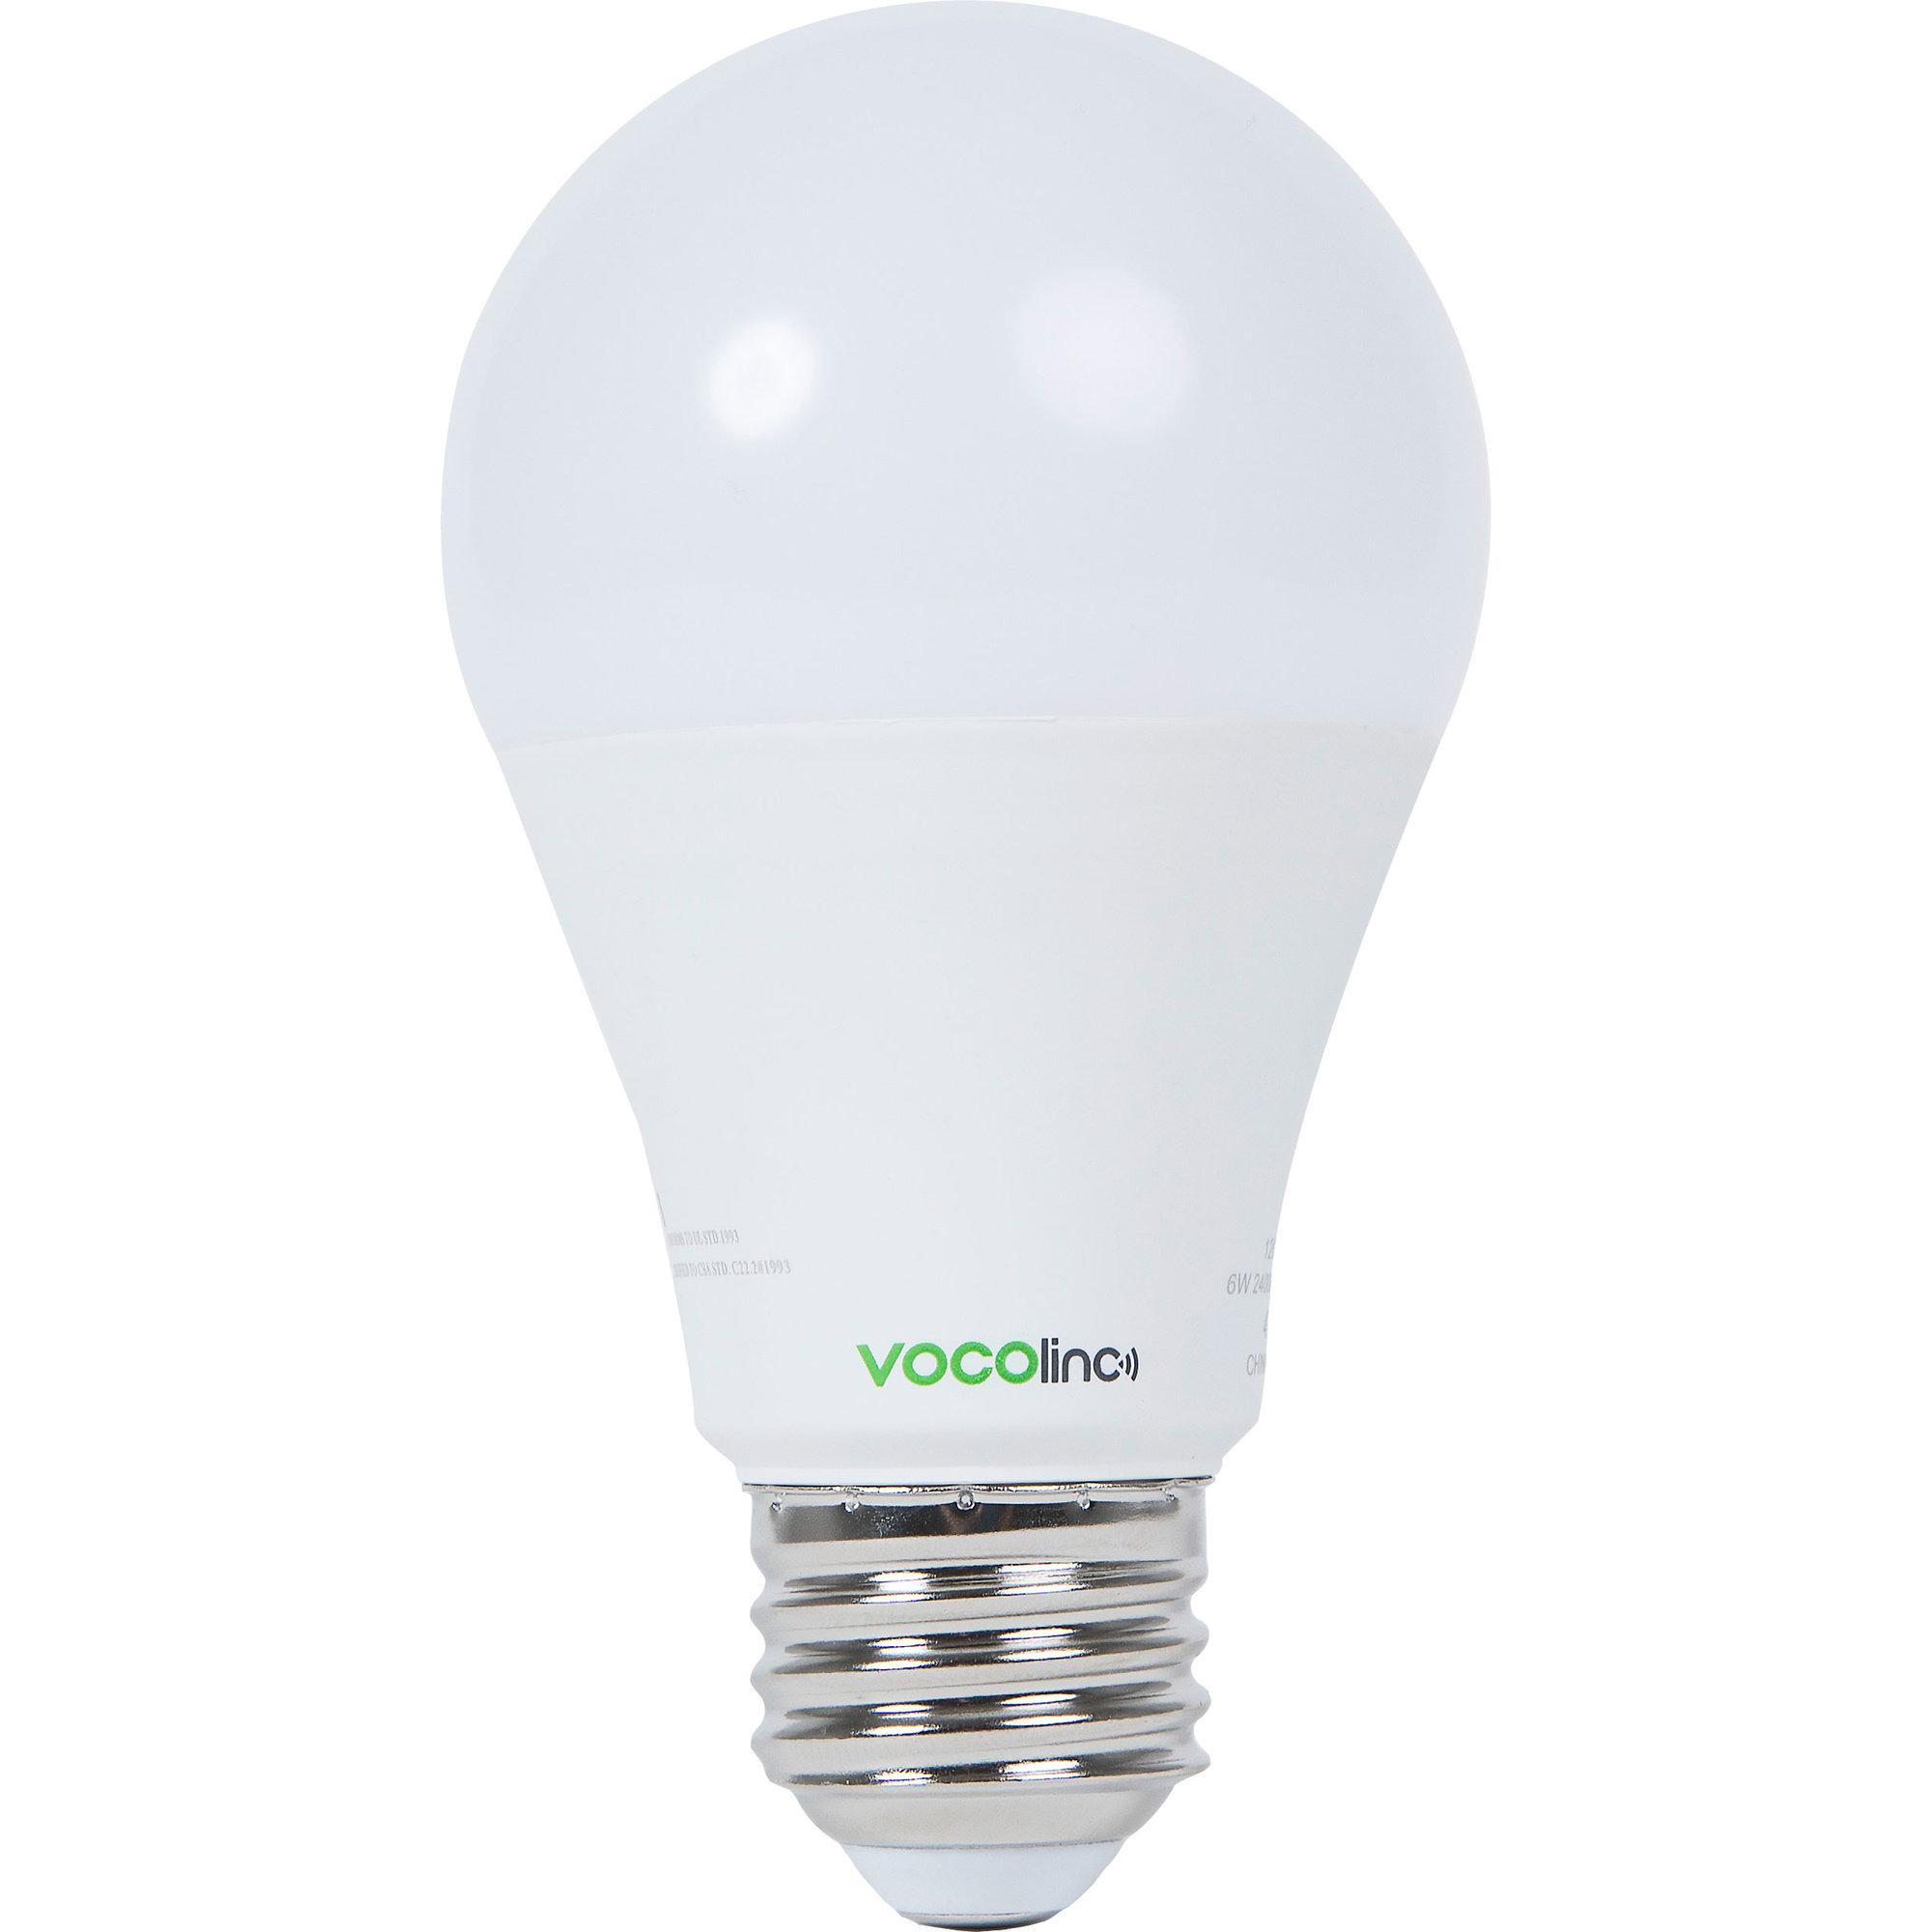 VOCOlinc Smart WiFi Glödlampa (E27) 50W